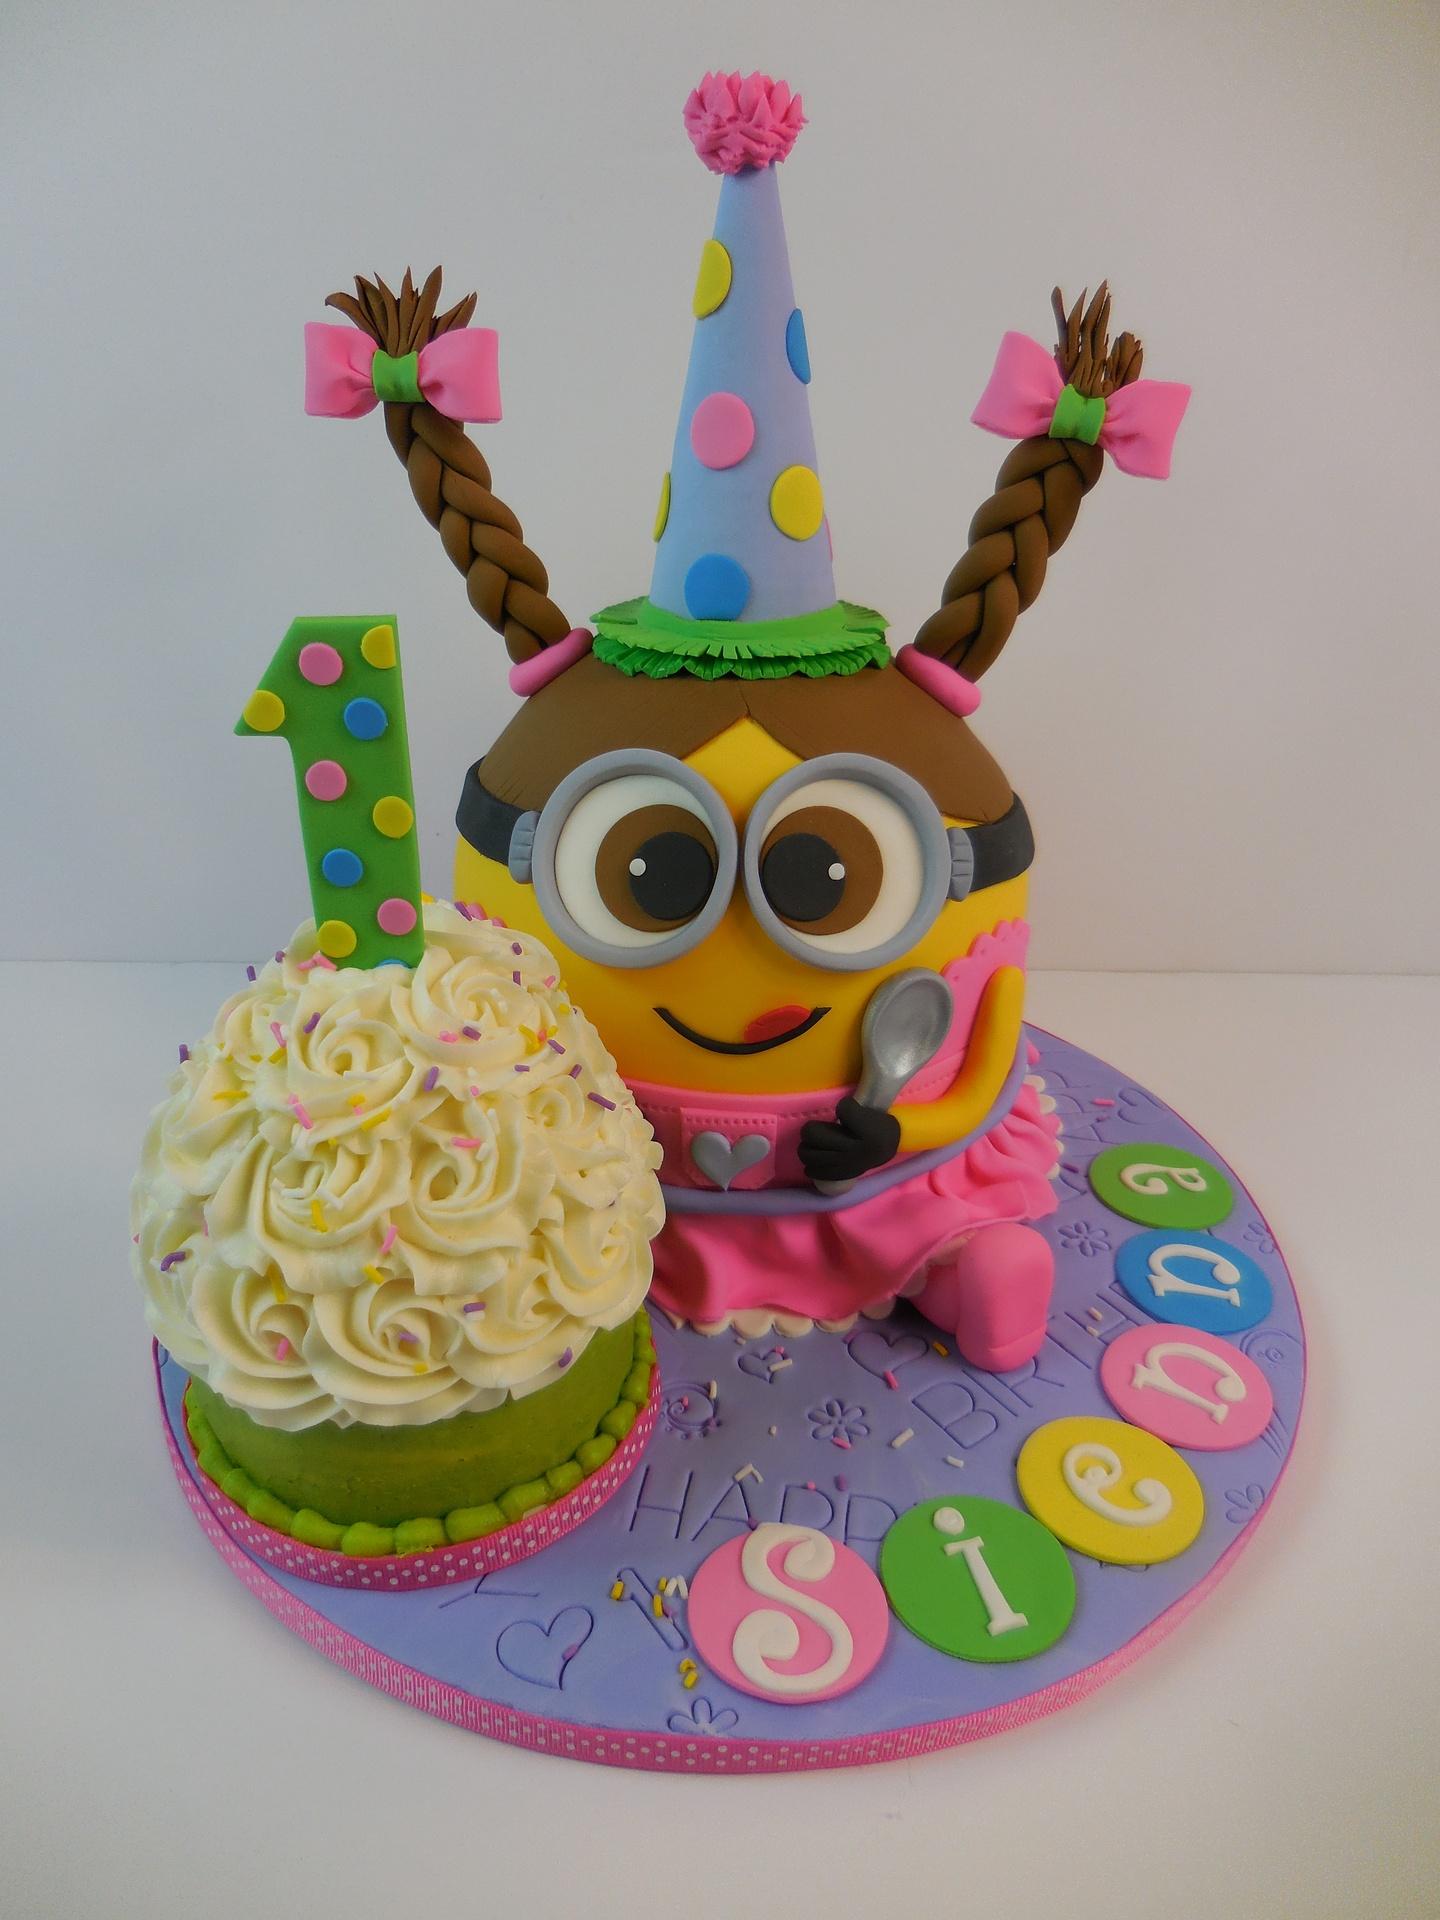 Siennas Minion Girl With Cupcake 1st Birthday